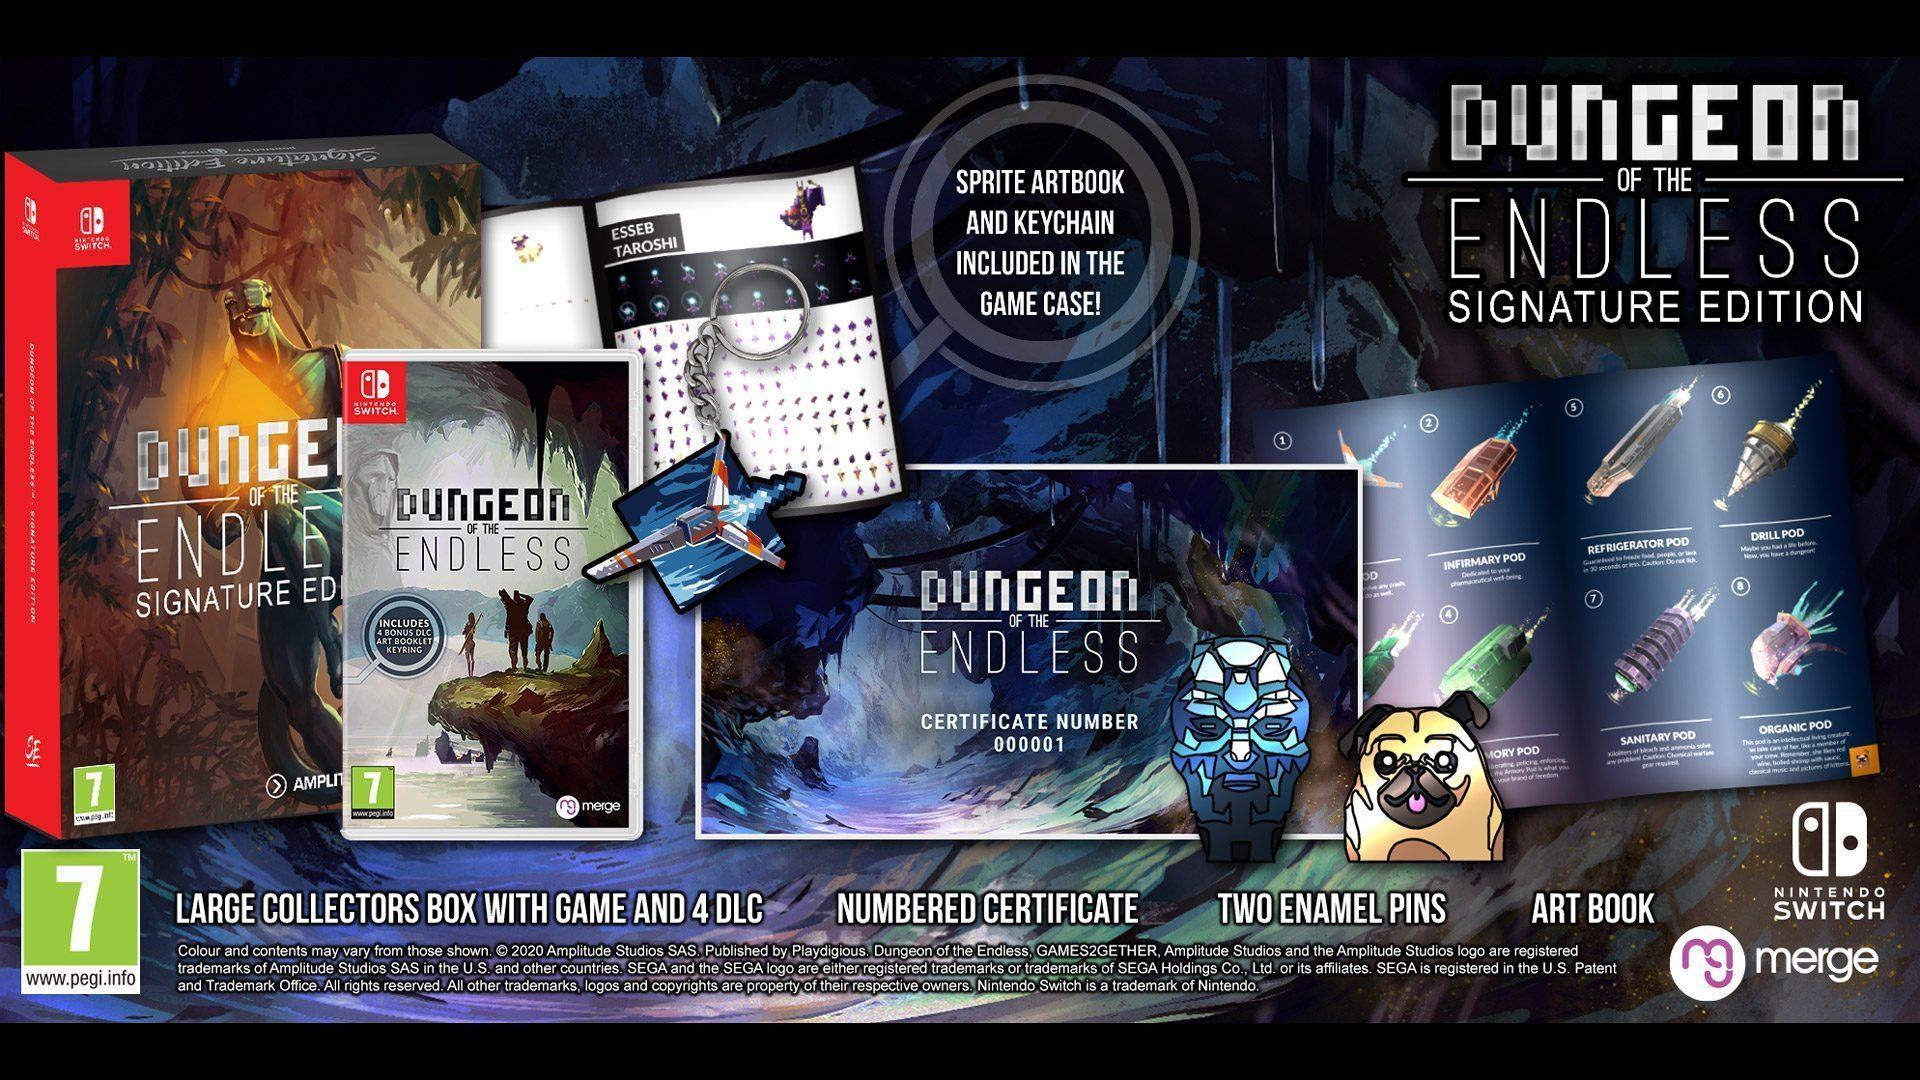 dungeonendless_vig_sig